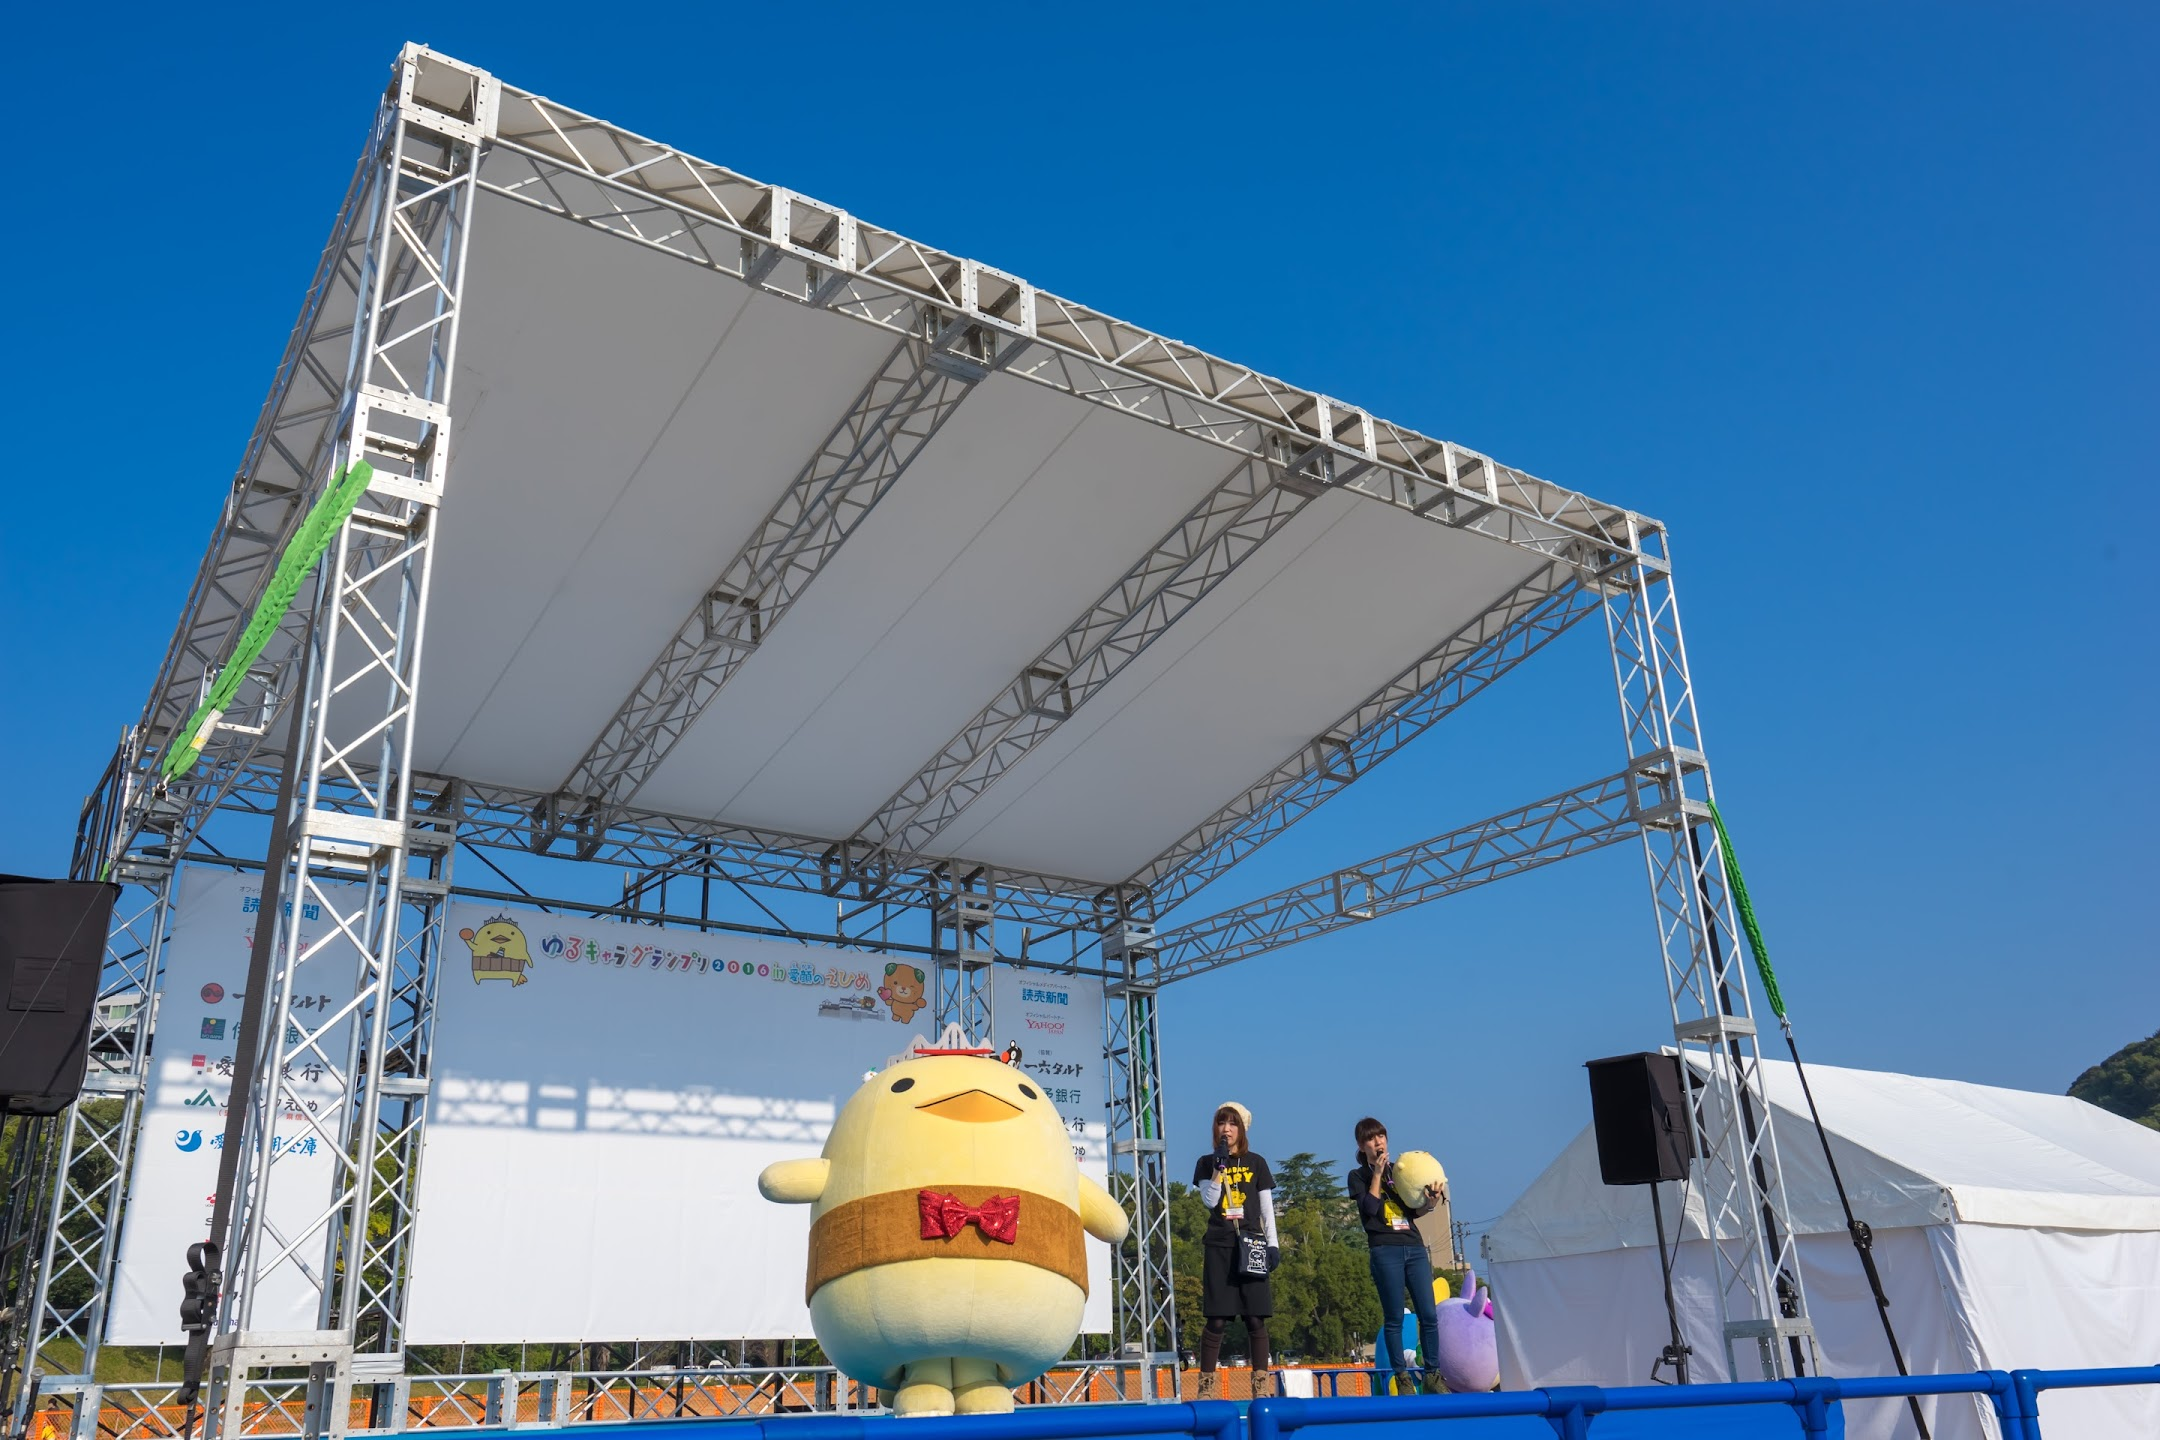 Yuru-chara Grand Prix Barysan1